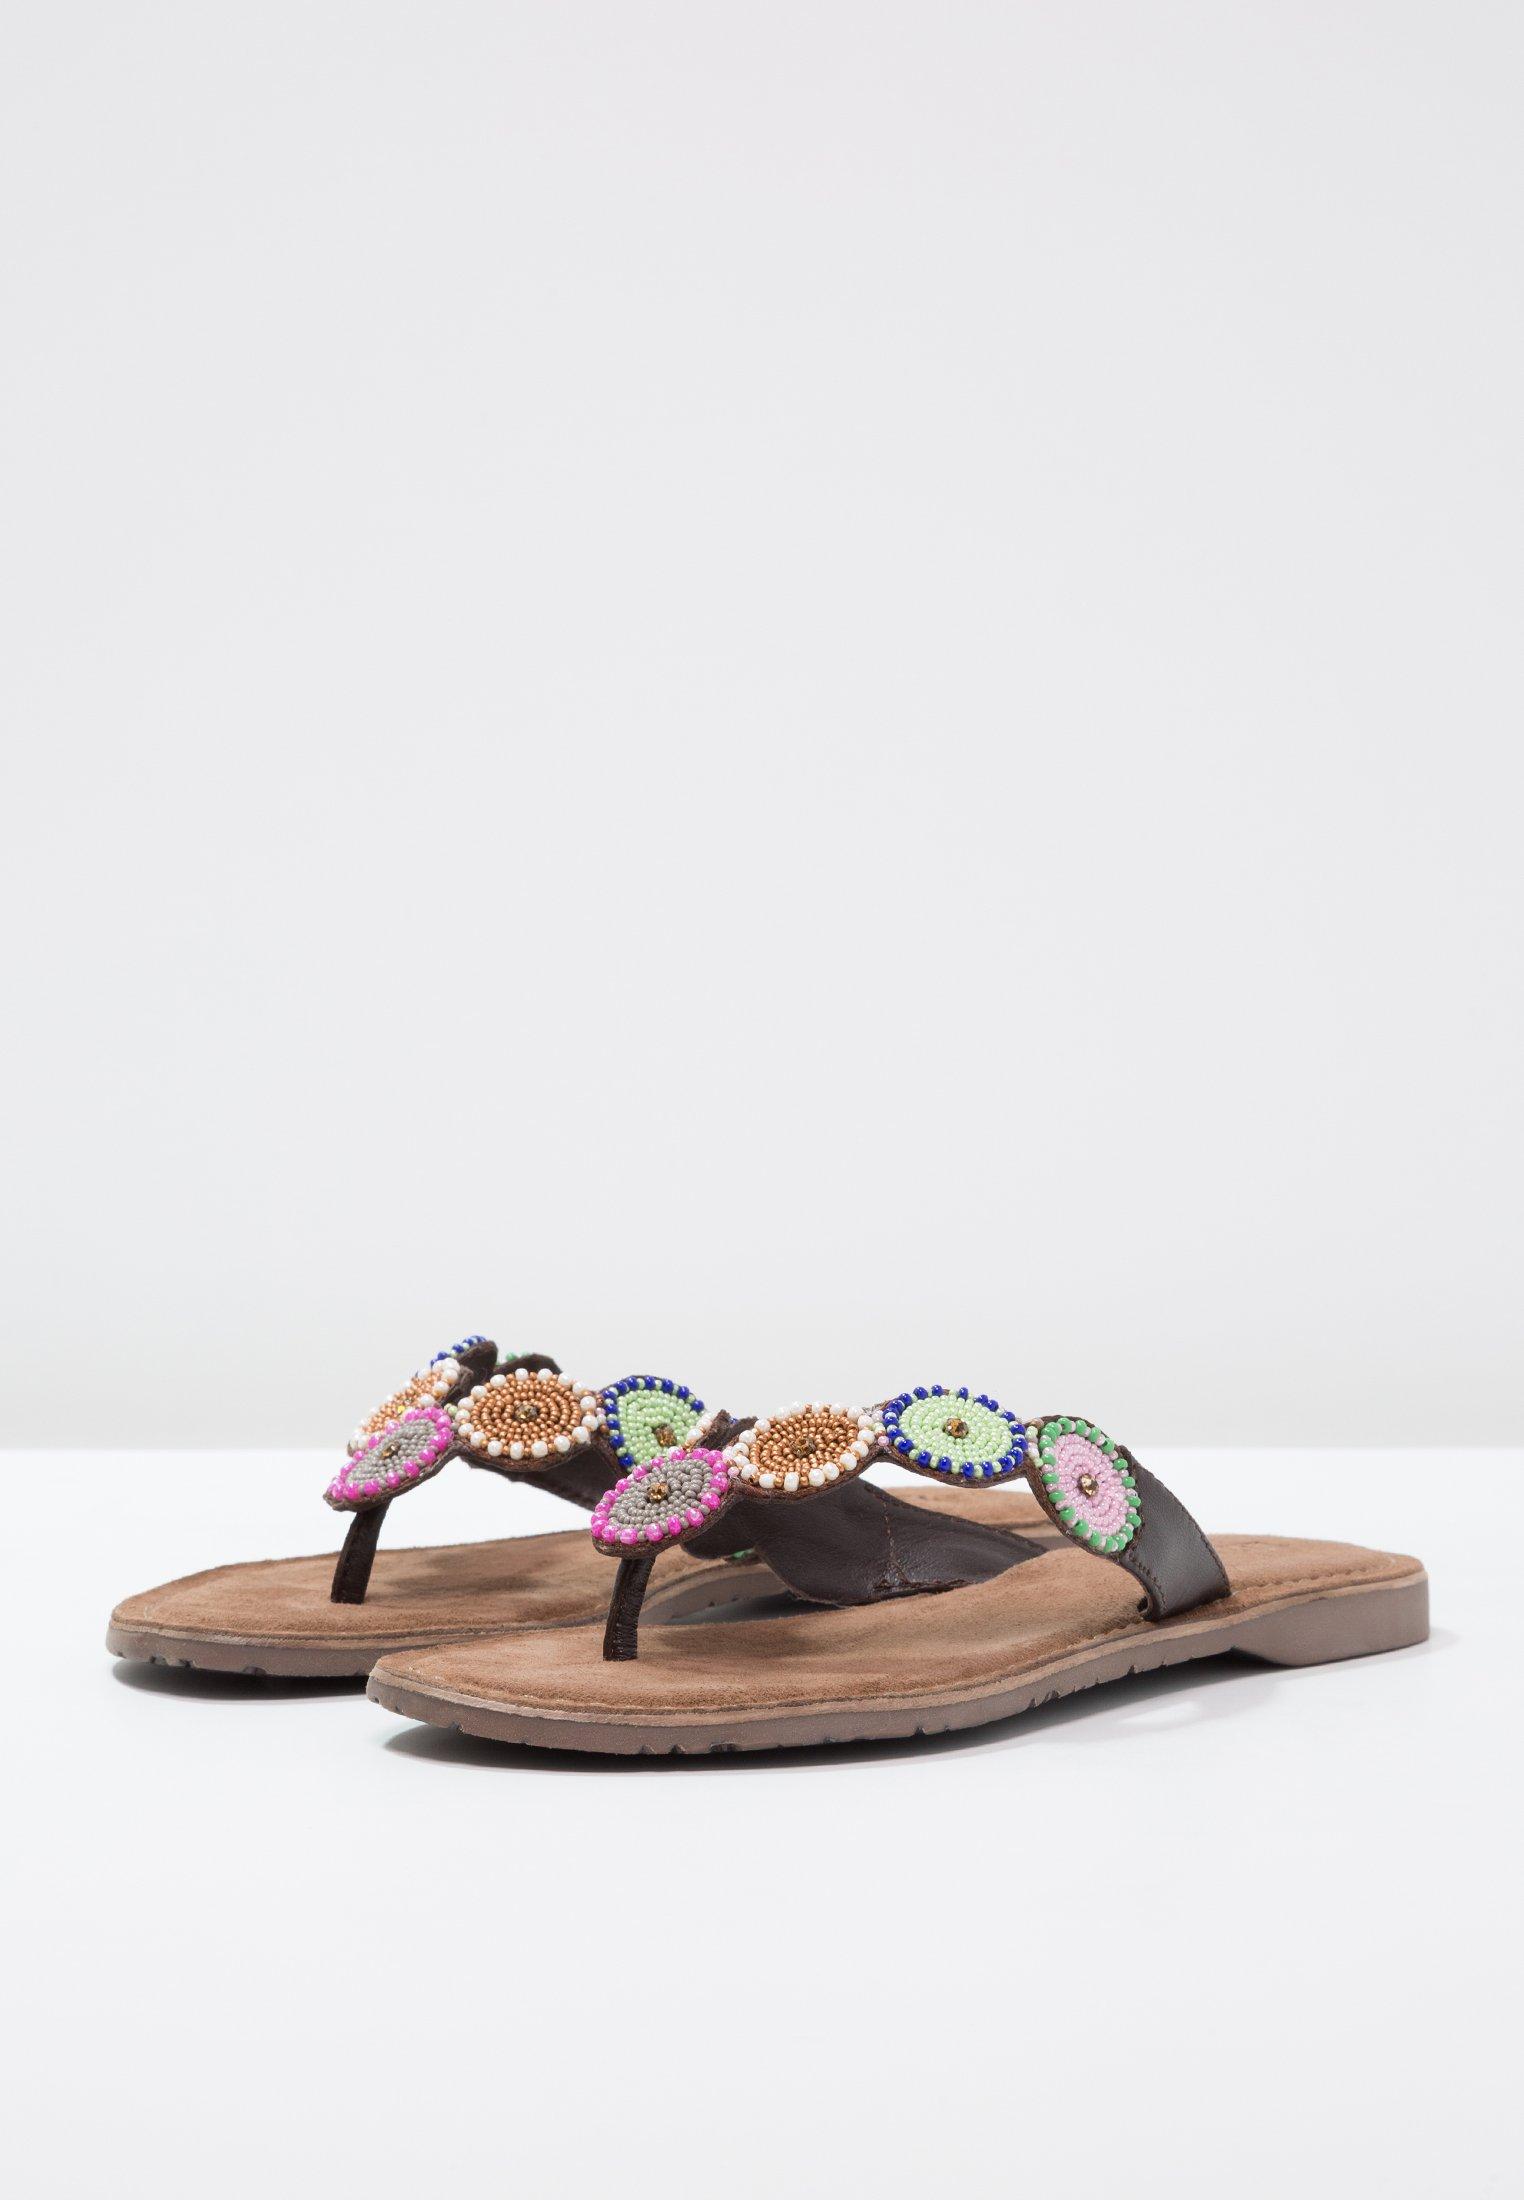 Lazamani T-bar sandals - brown